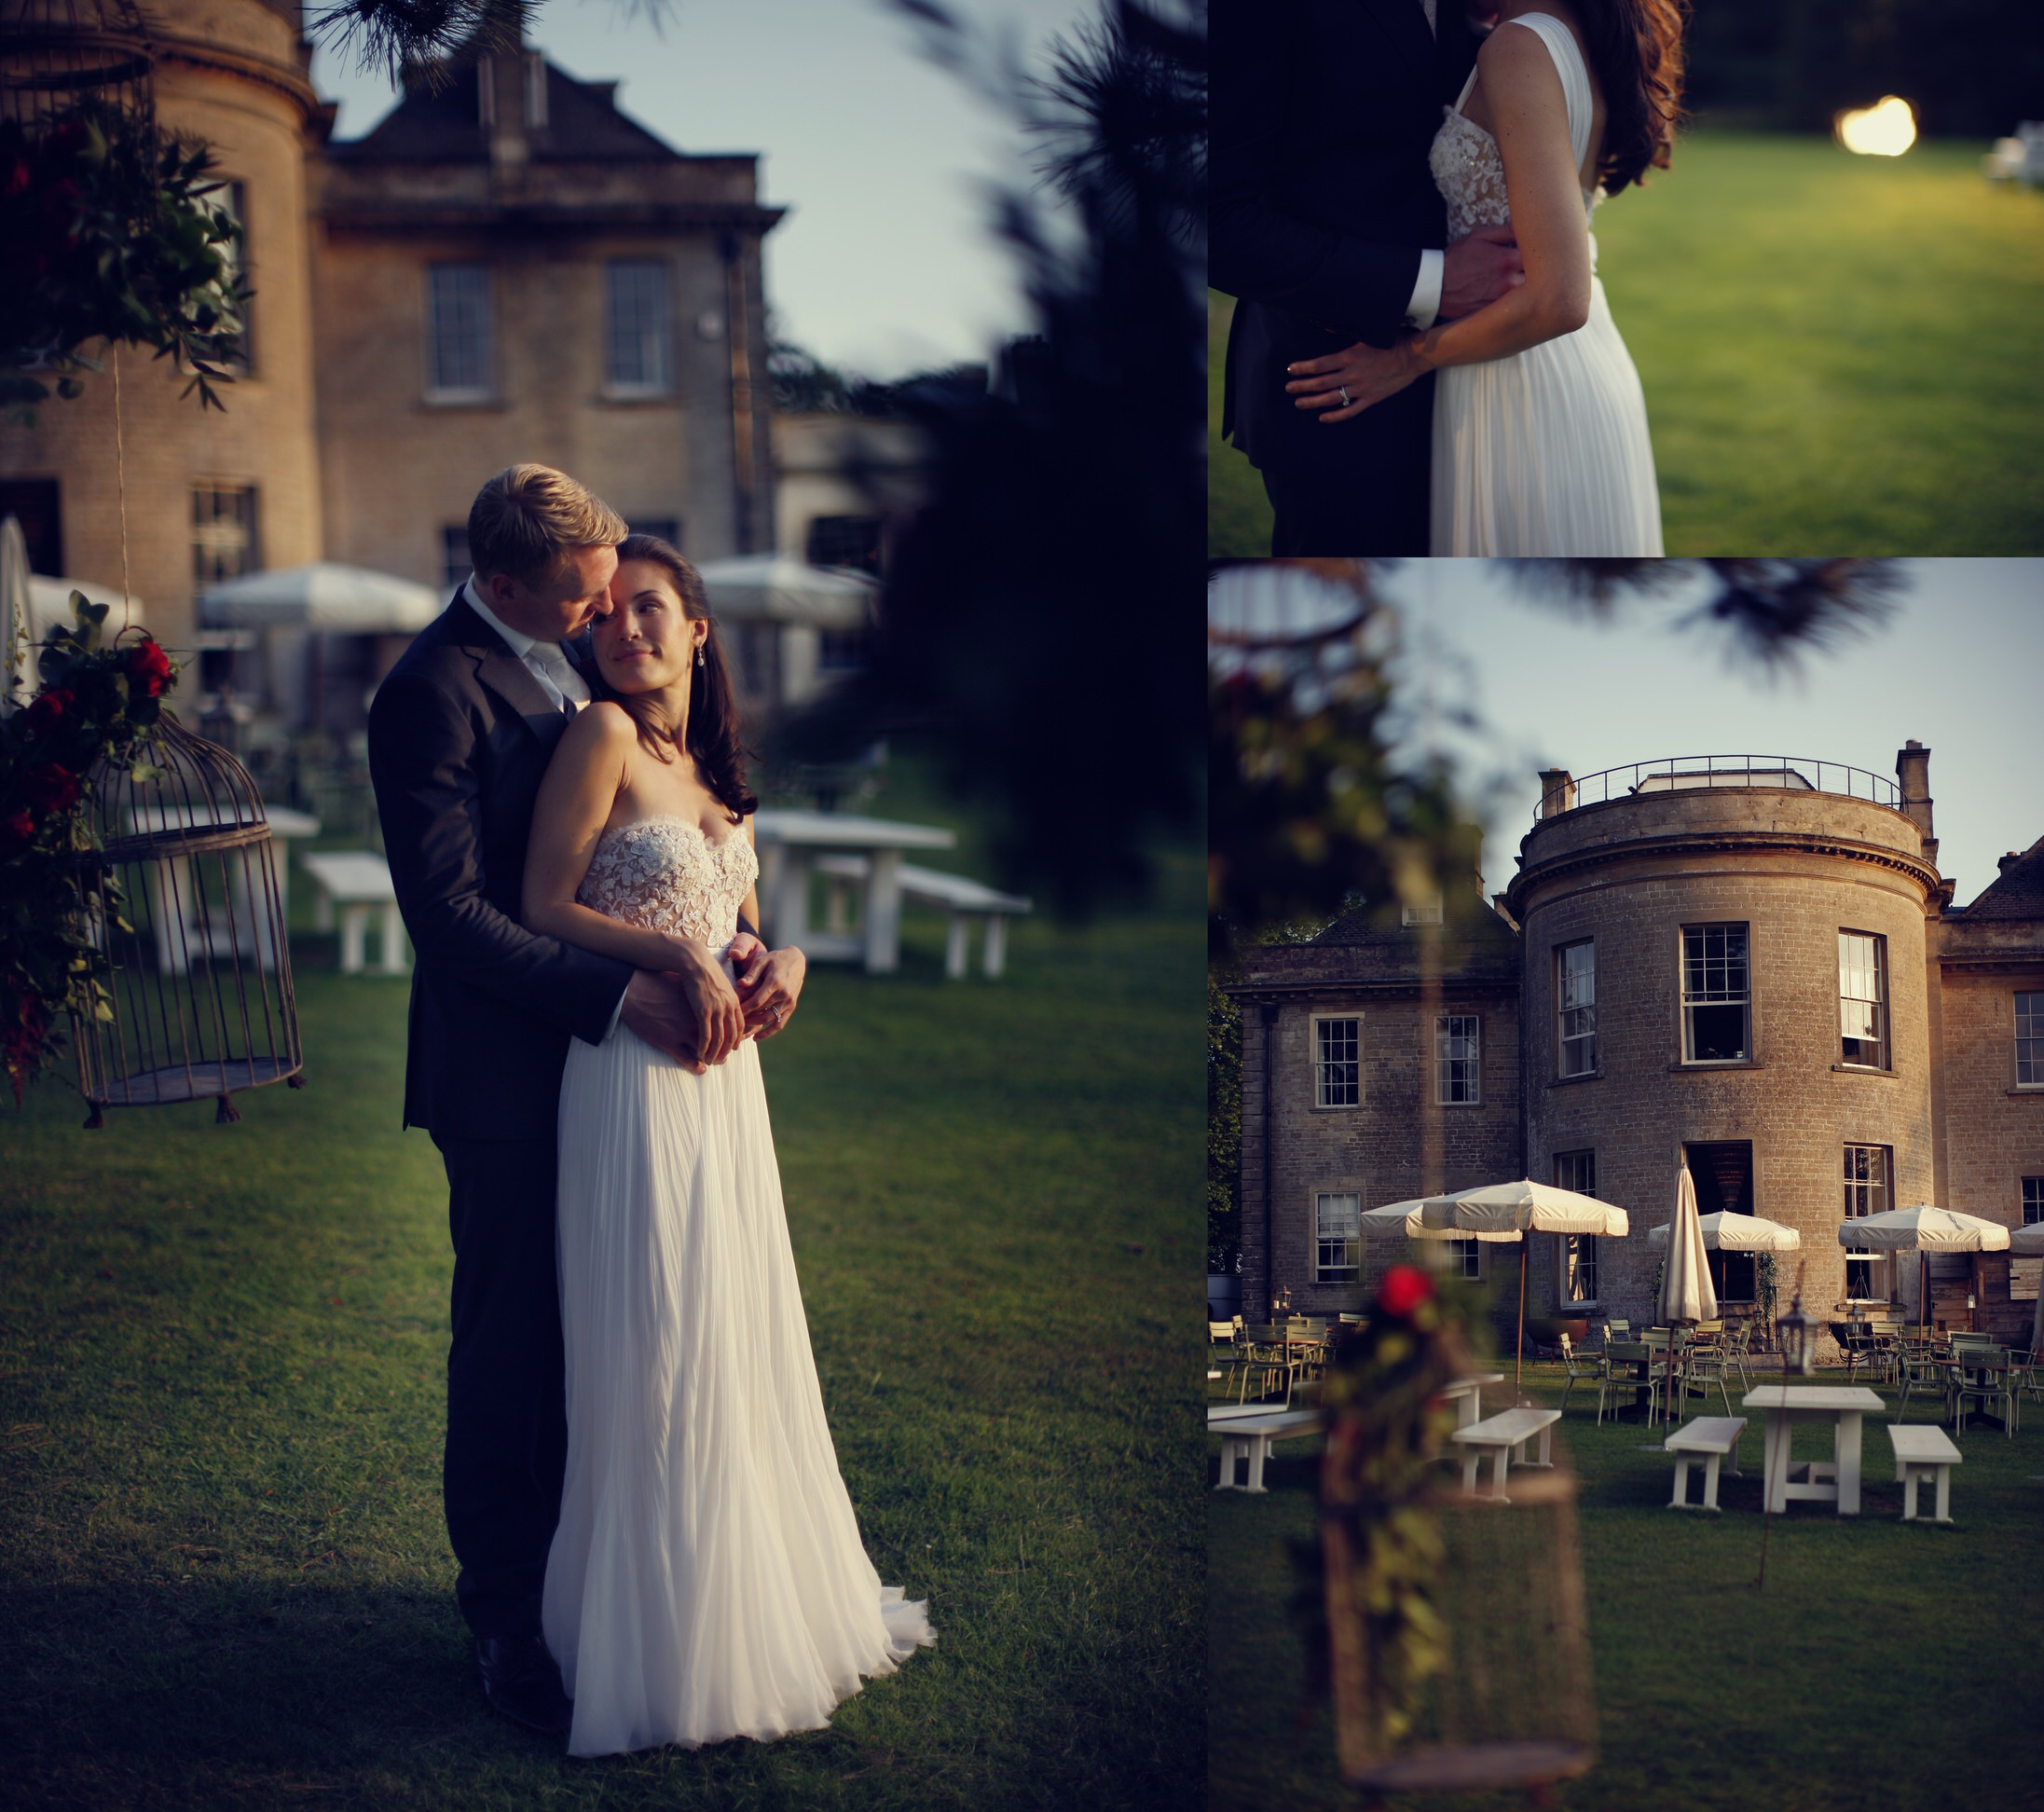 summer-wedding-babington-house-london-weddings_0024.jpg